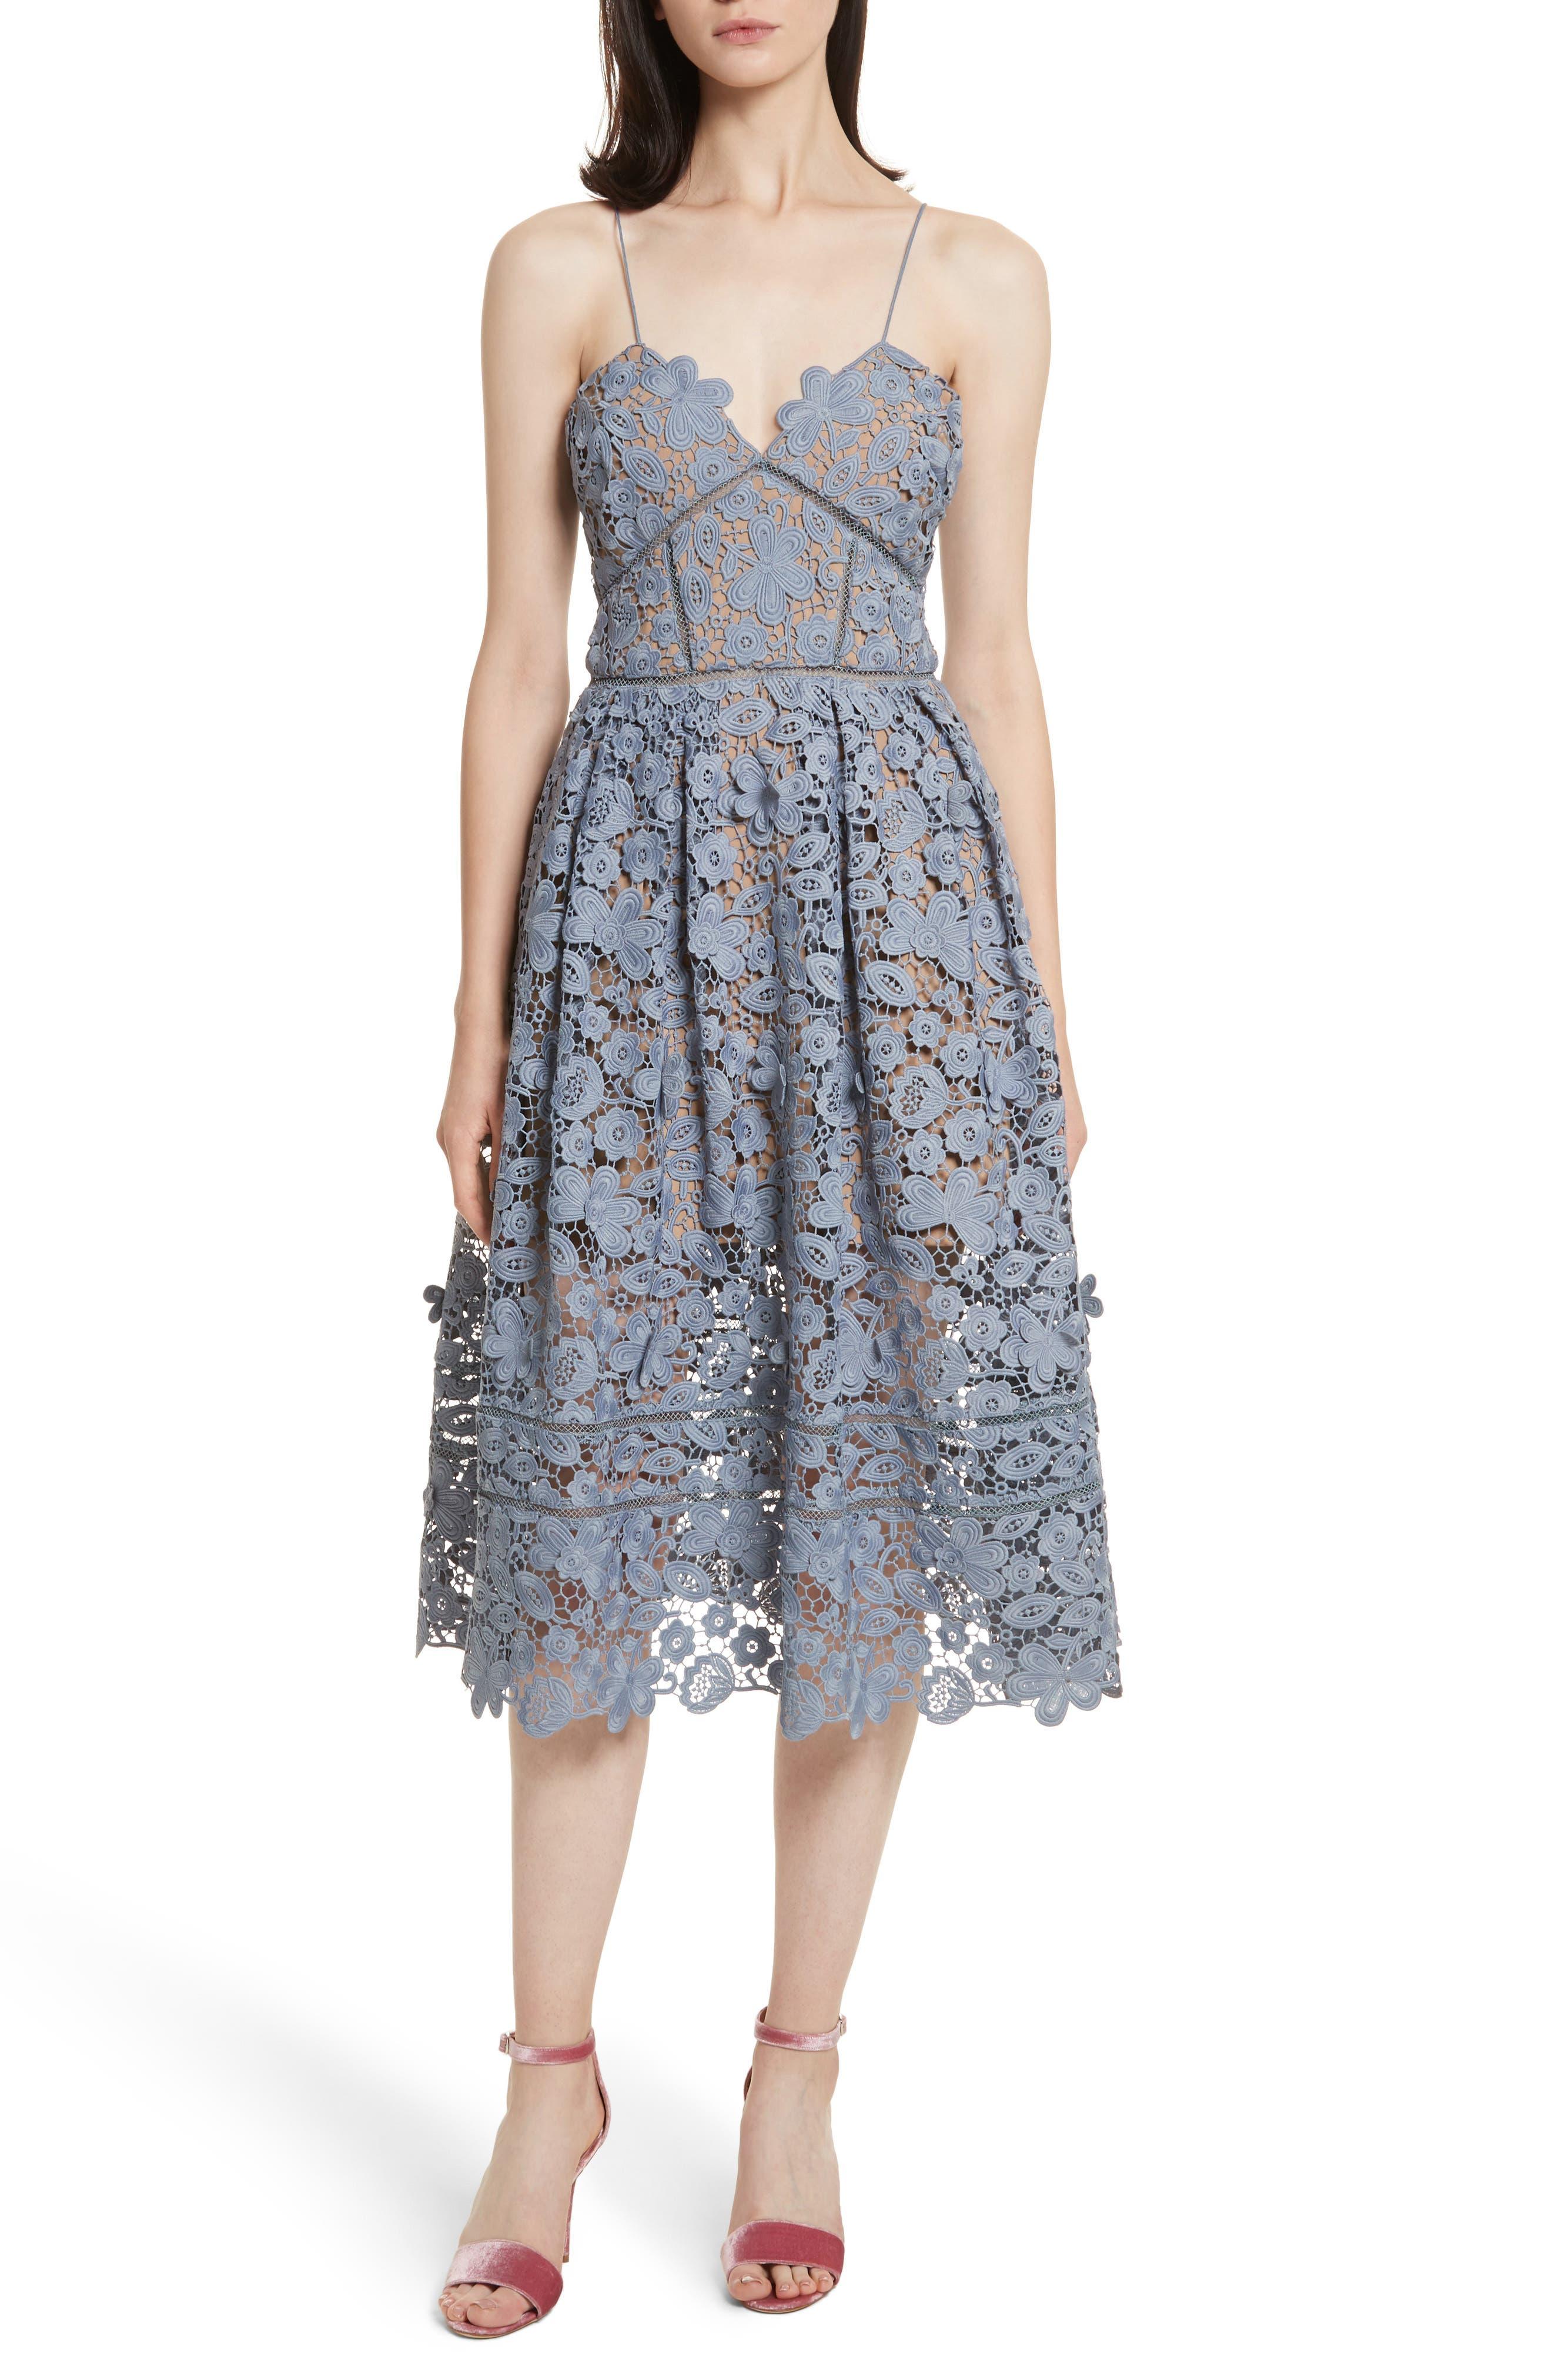 Alternate Image 1 Selected - Self-Portrait Azaelea 3D Lace Fit & Flare Dress